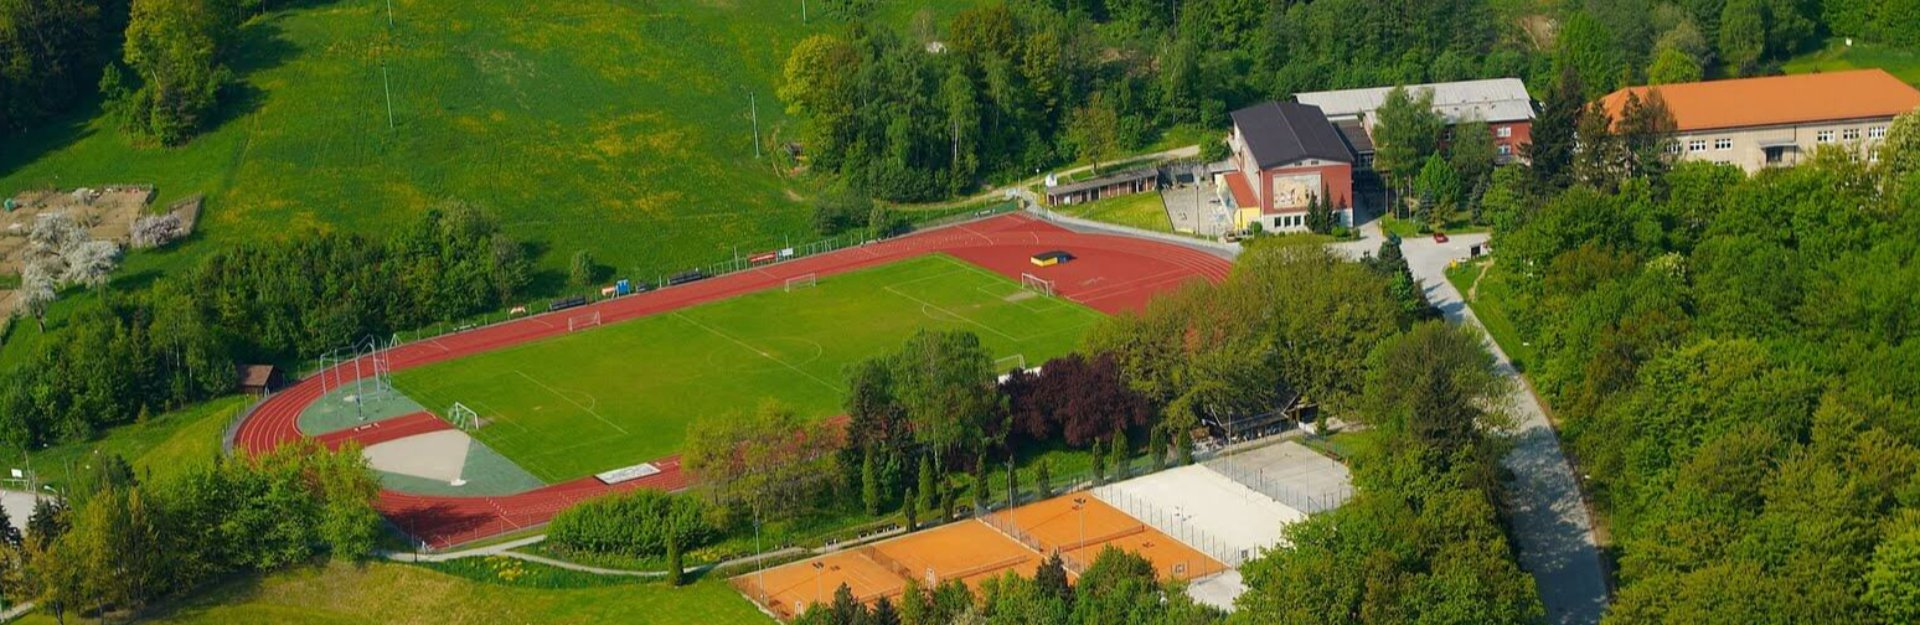 Športni center Ravne